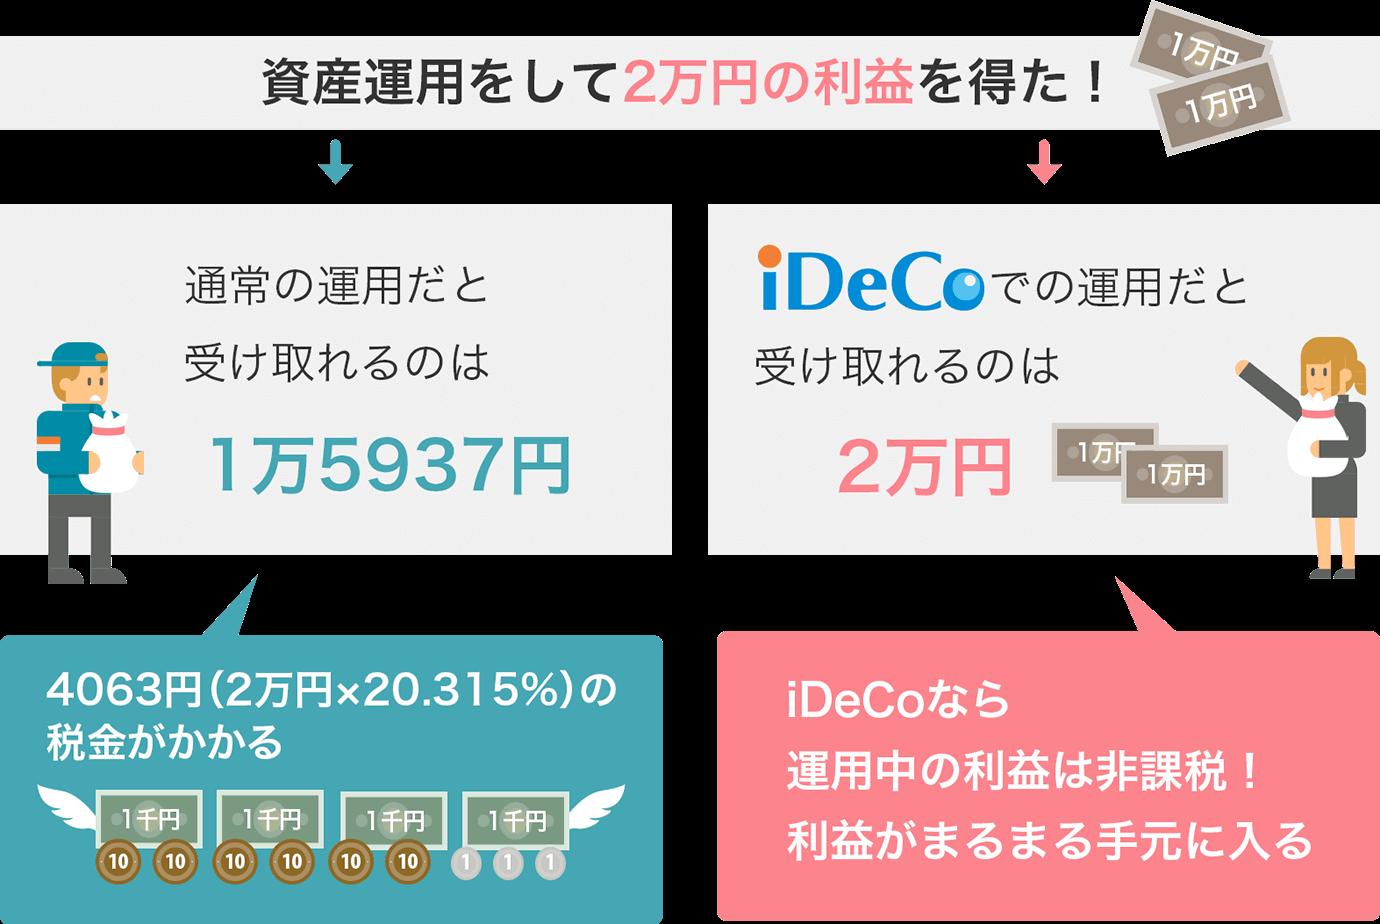 iDeCoの運用益は非課税